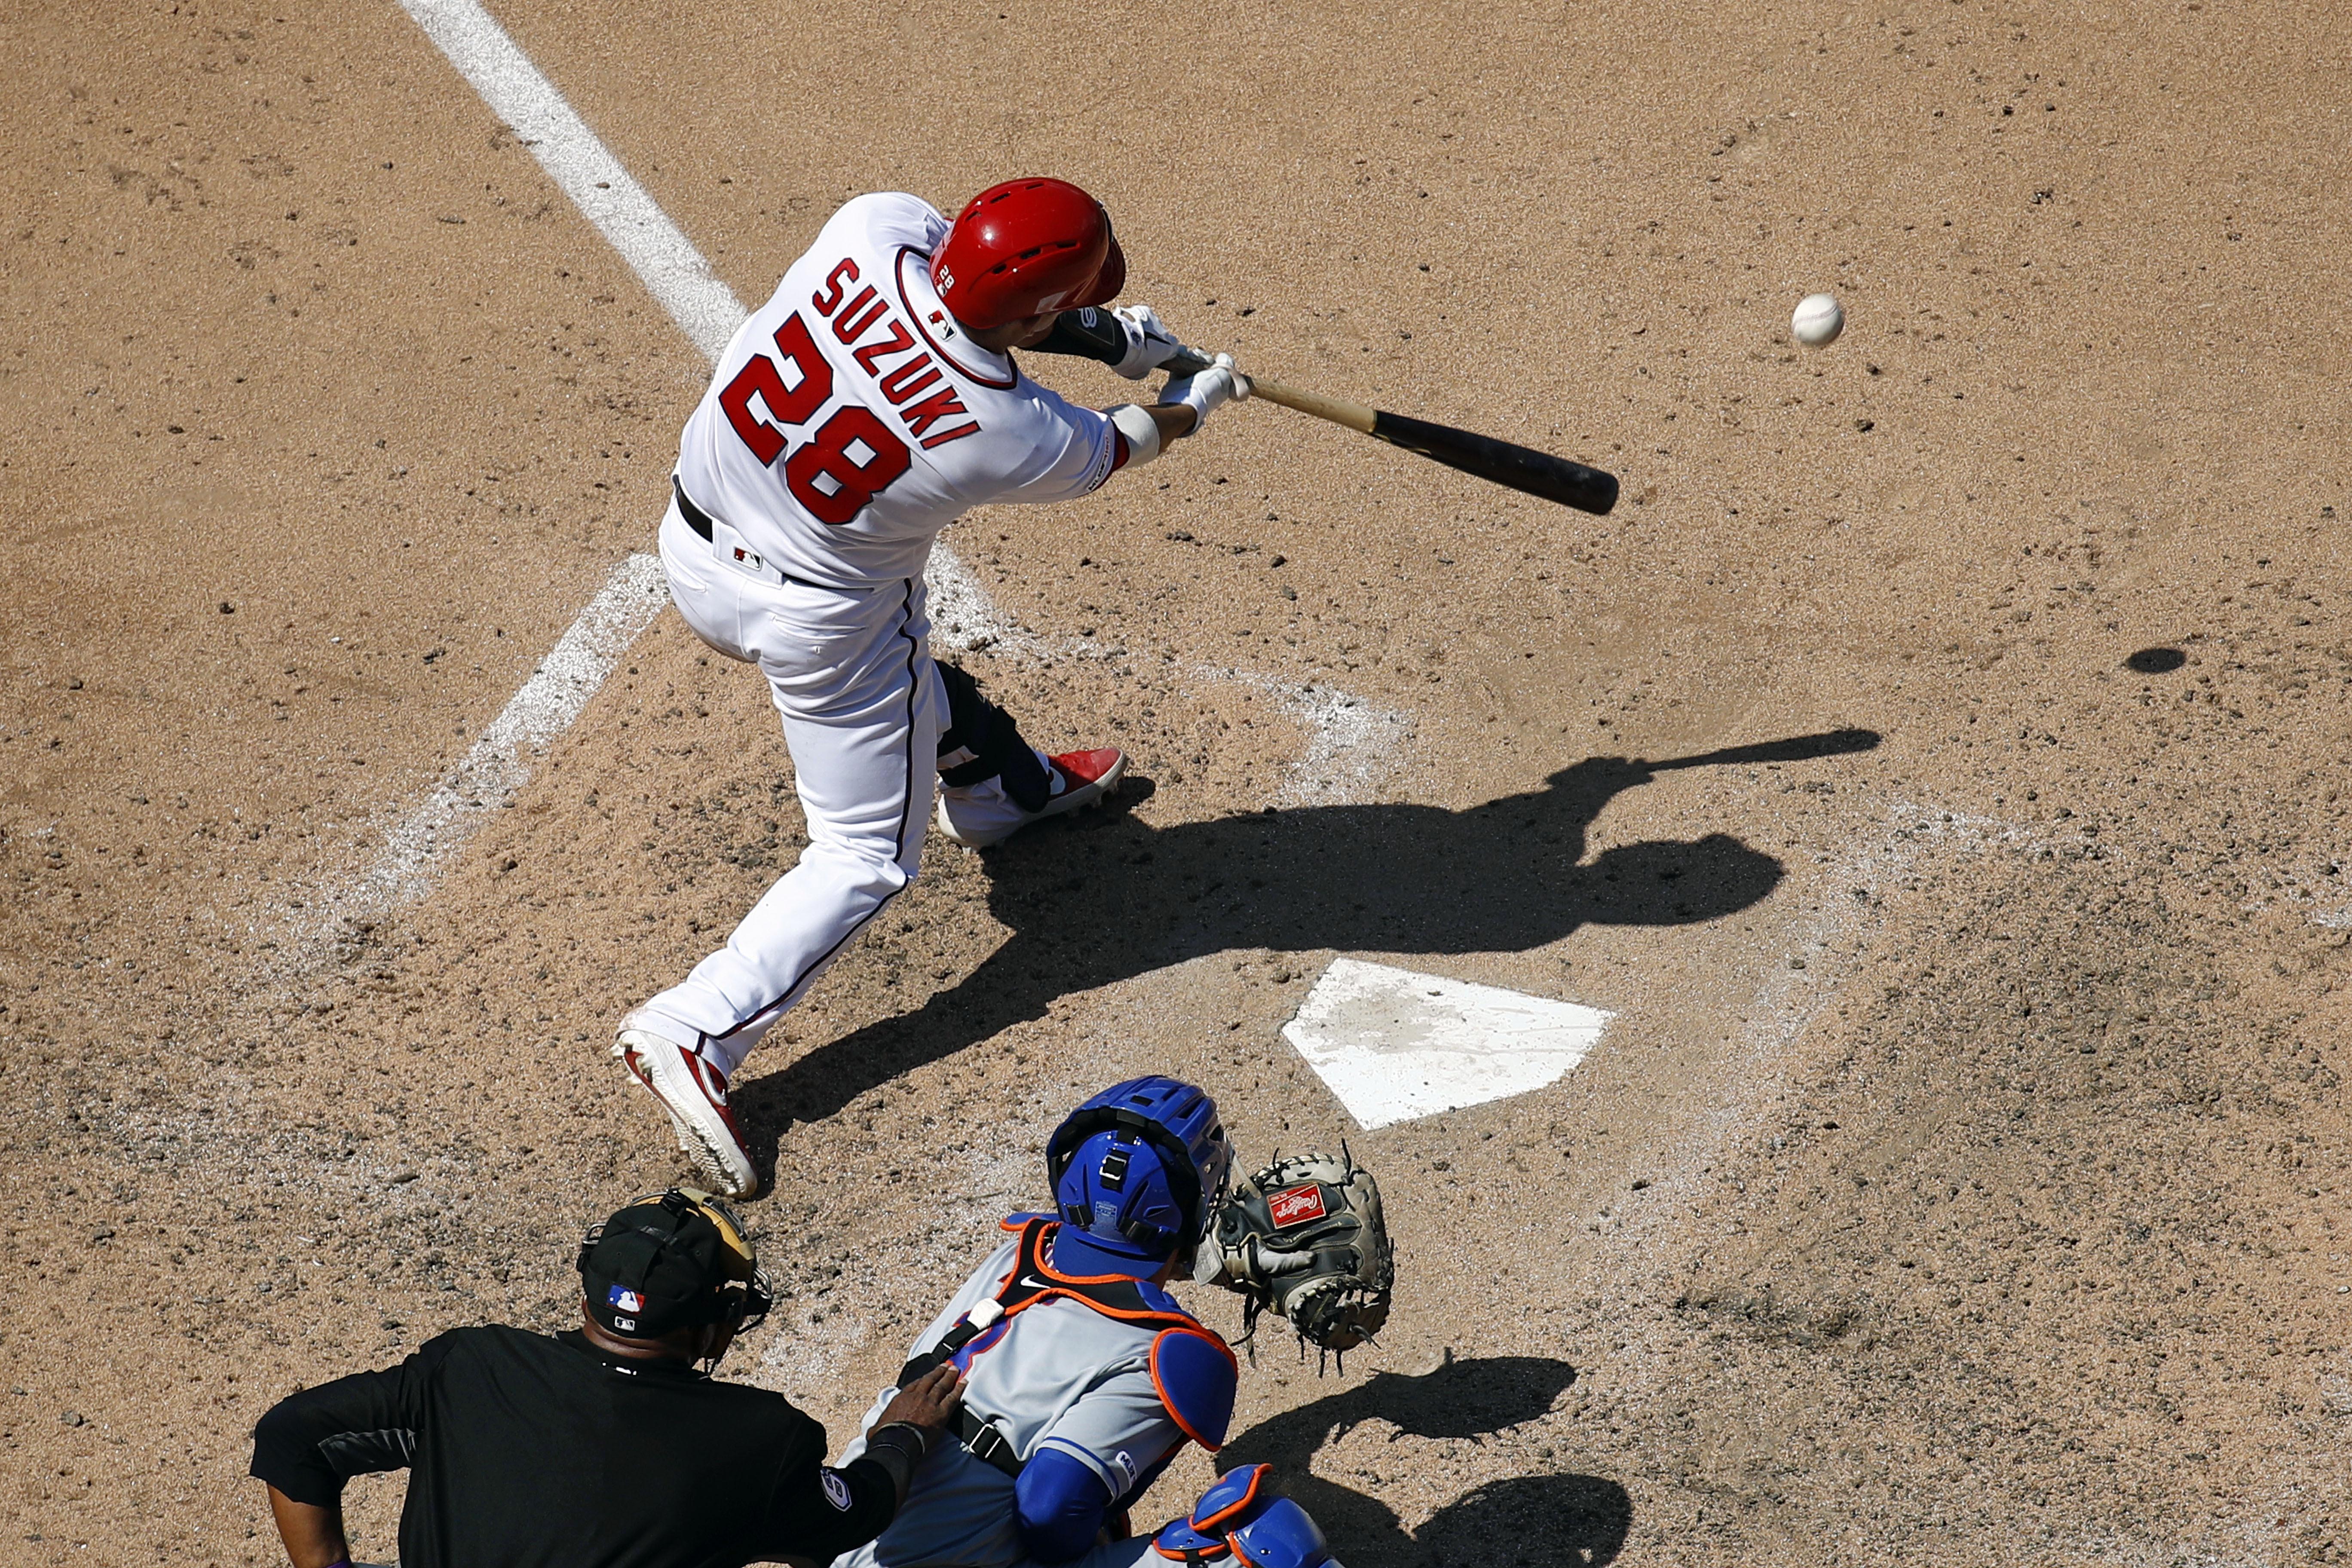 MLB still vexed by longer games, shrinking attendance - Washington Times